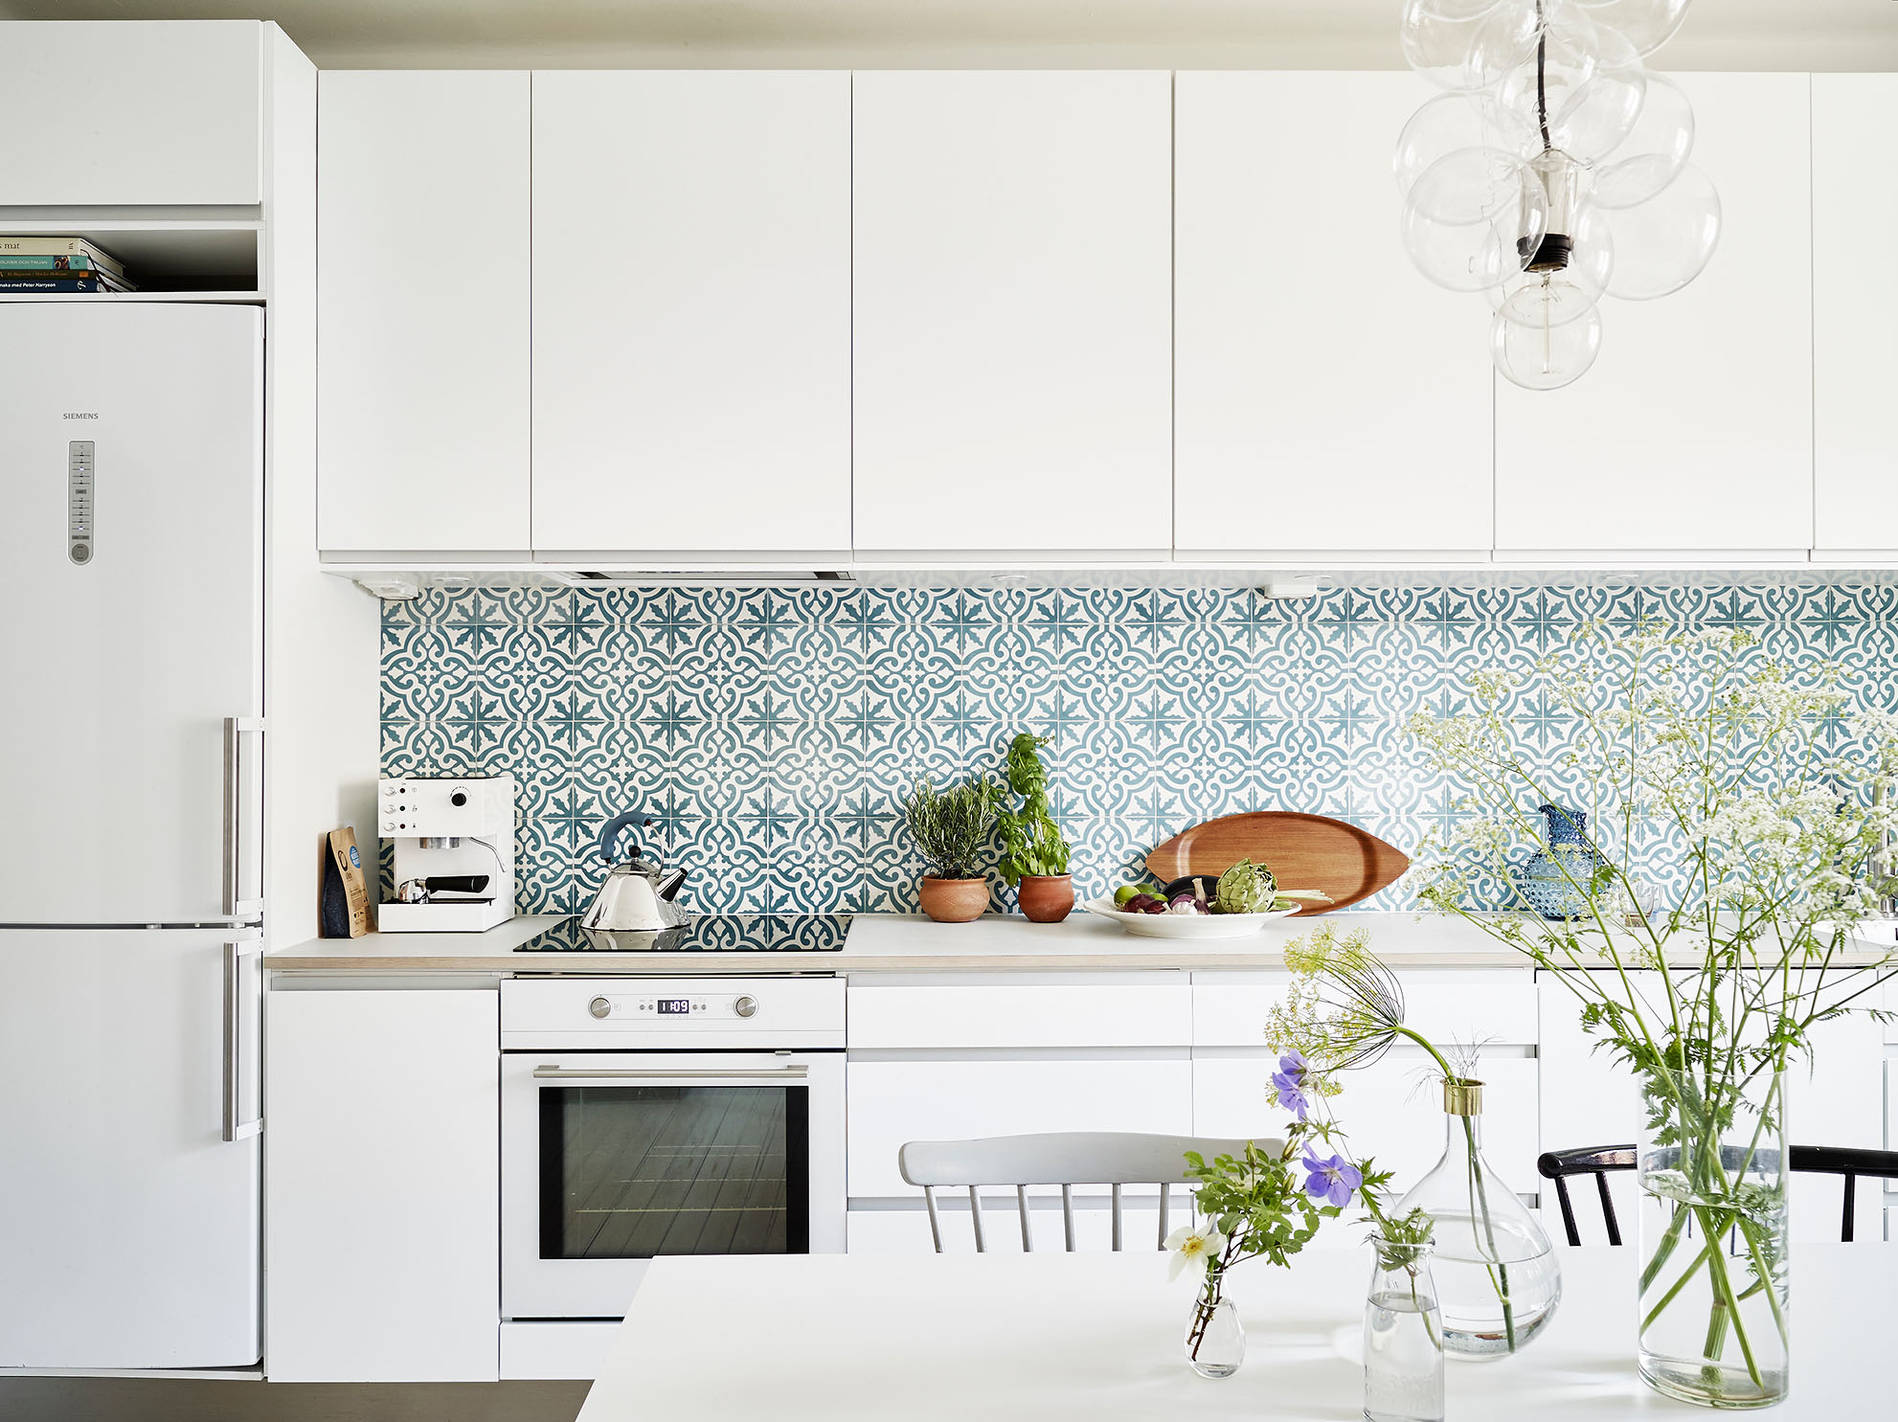 Keuken Licht Blauw : keuken blauw